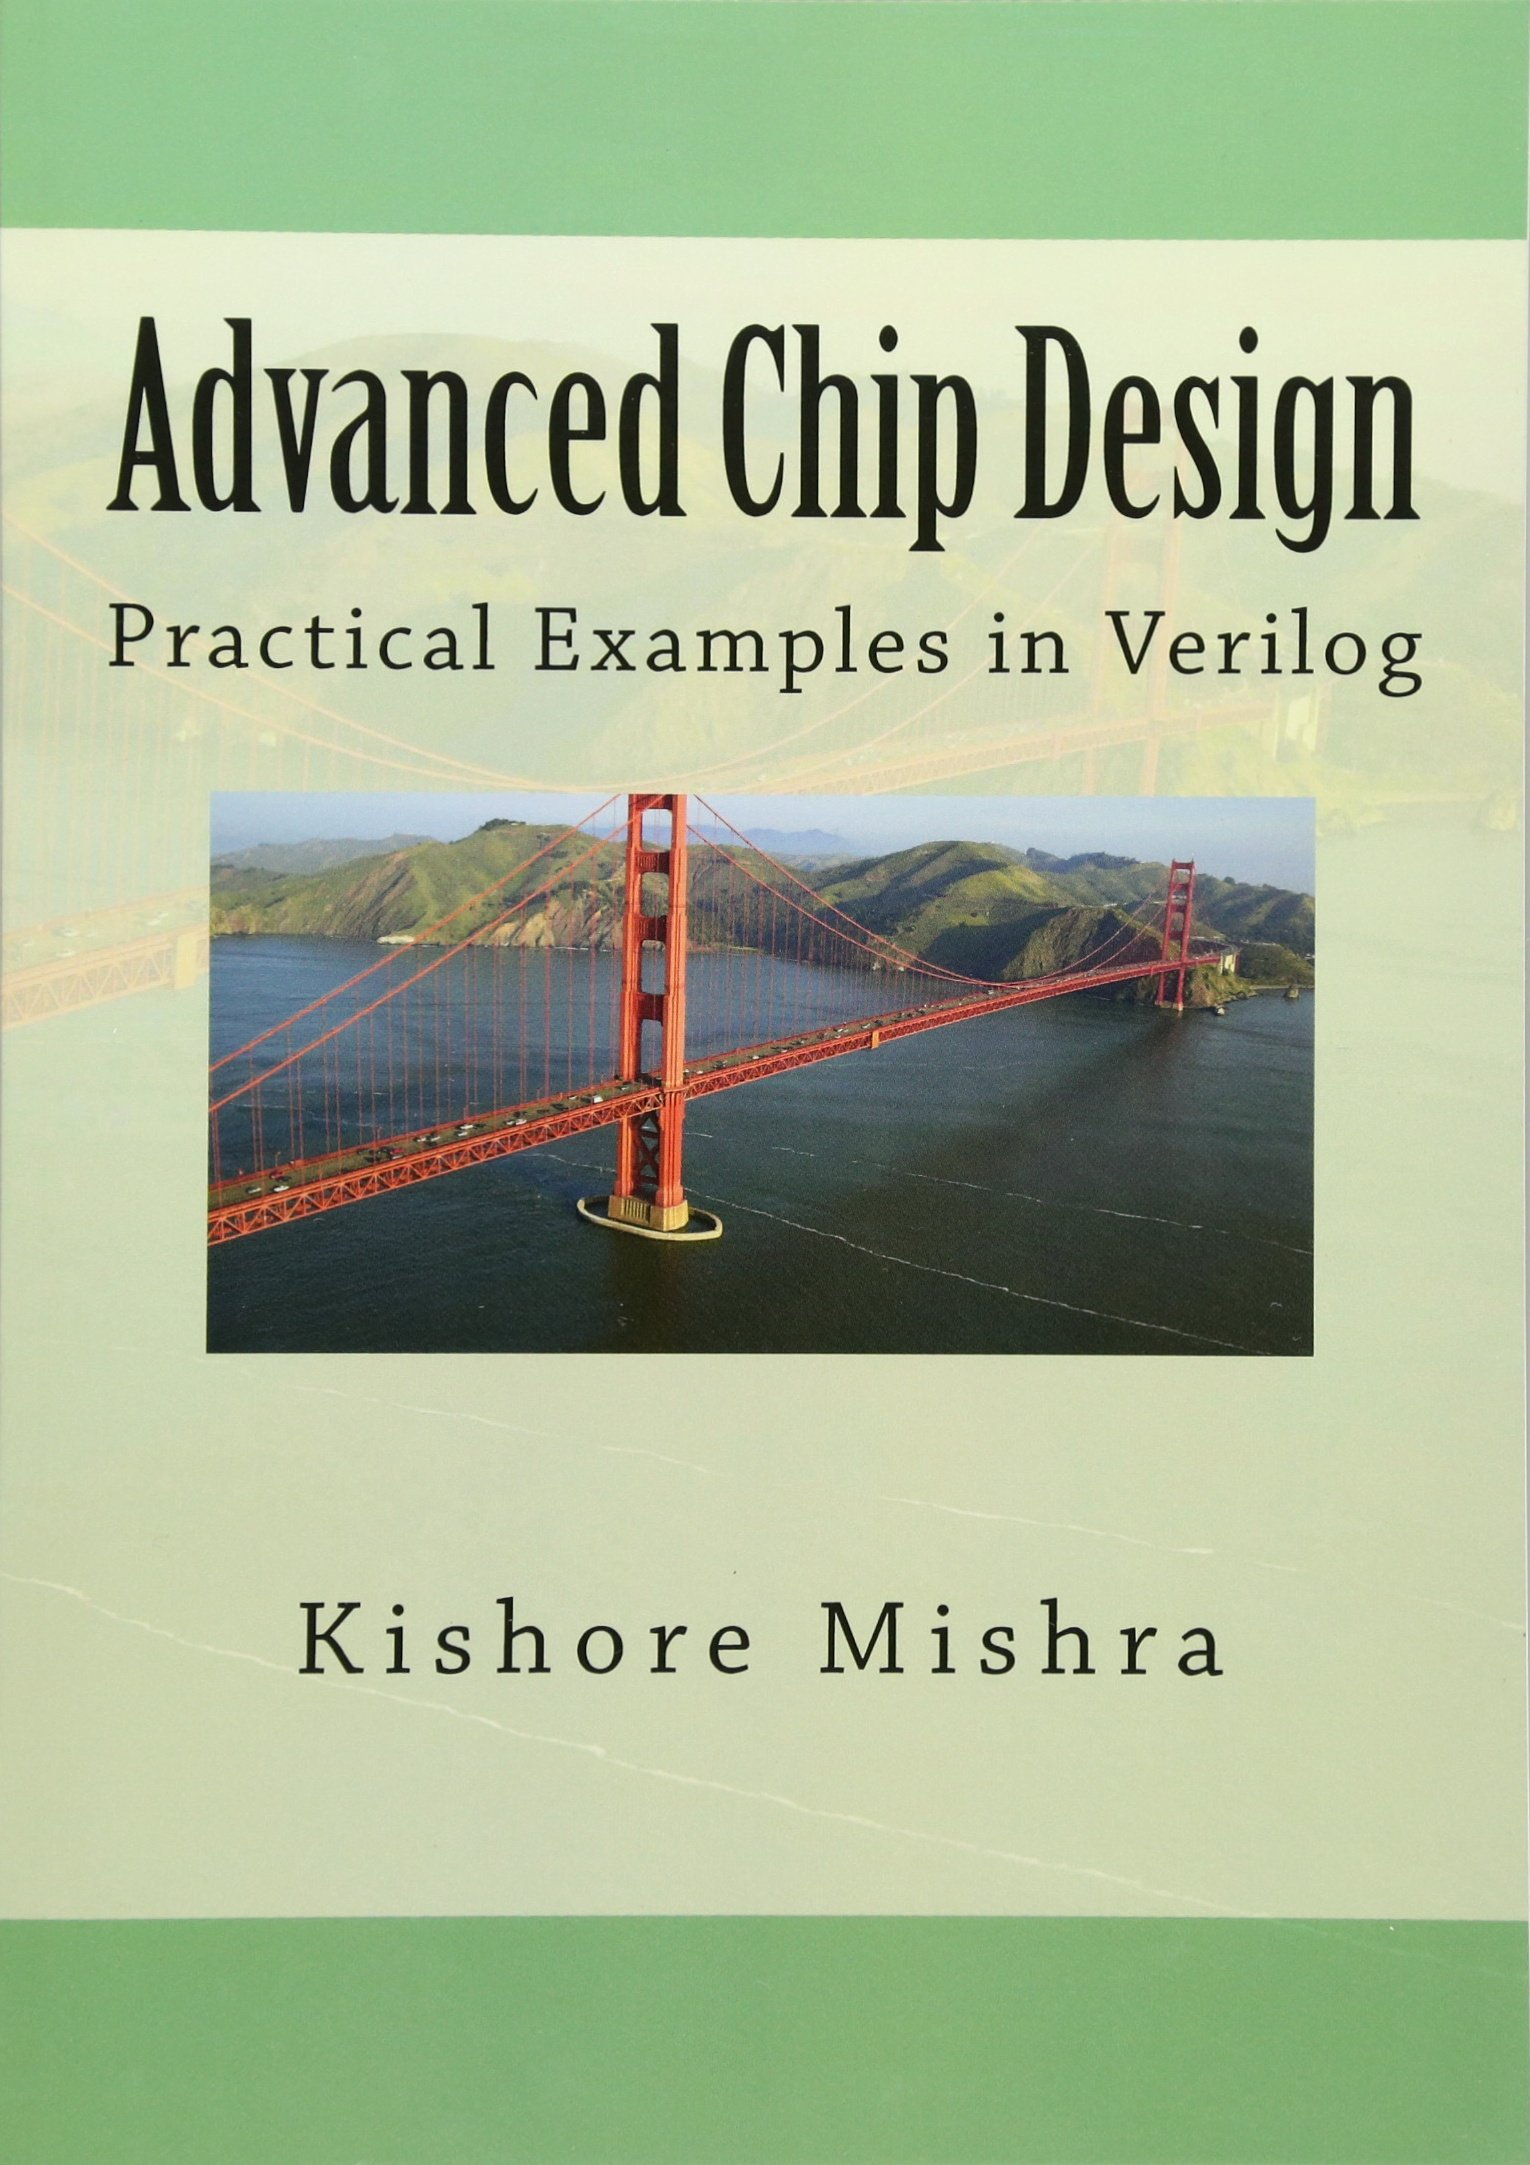 Advanced Chip Design, Practical Examples in Verilog: Mr